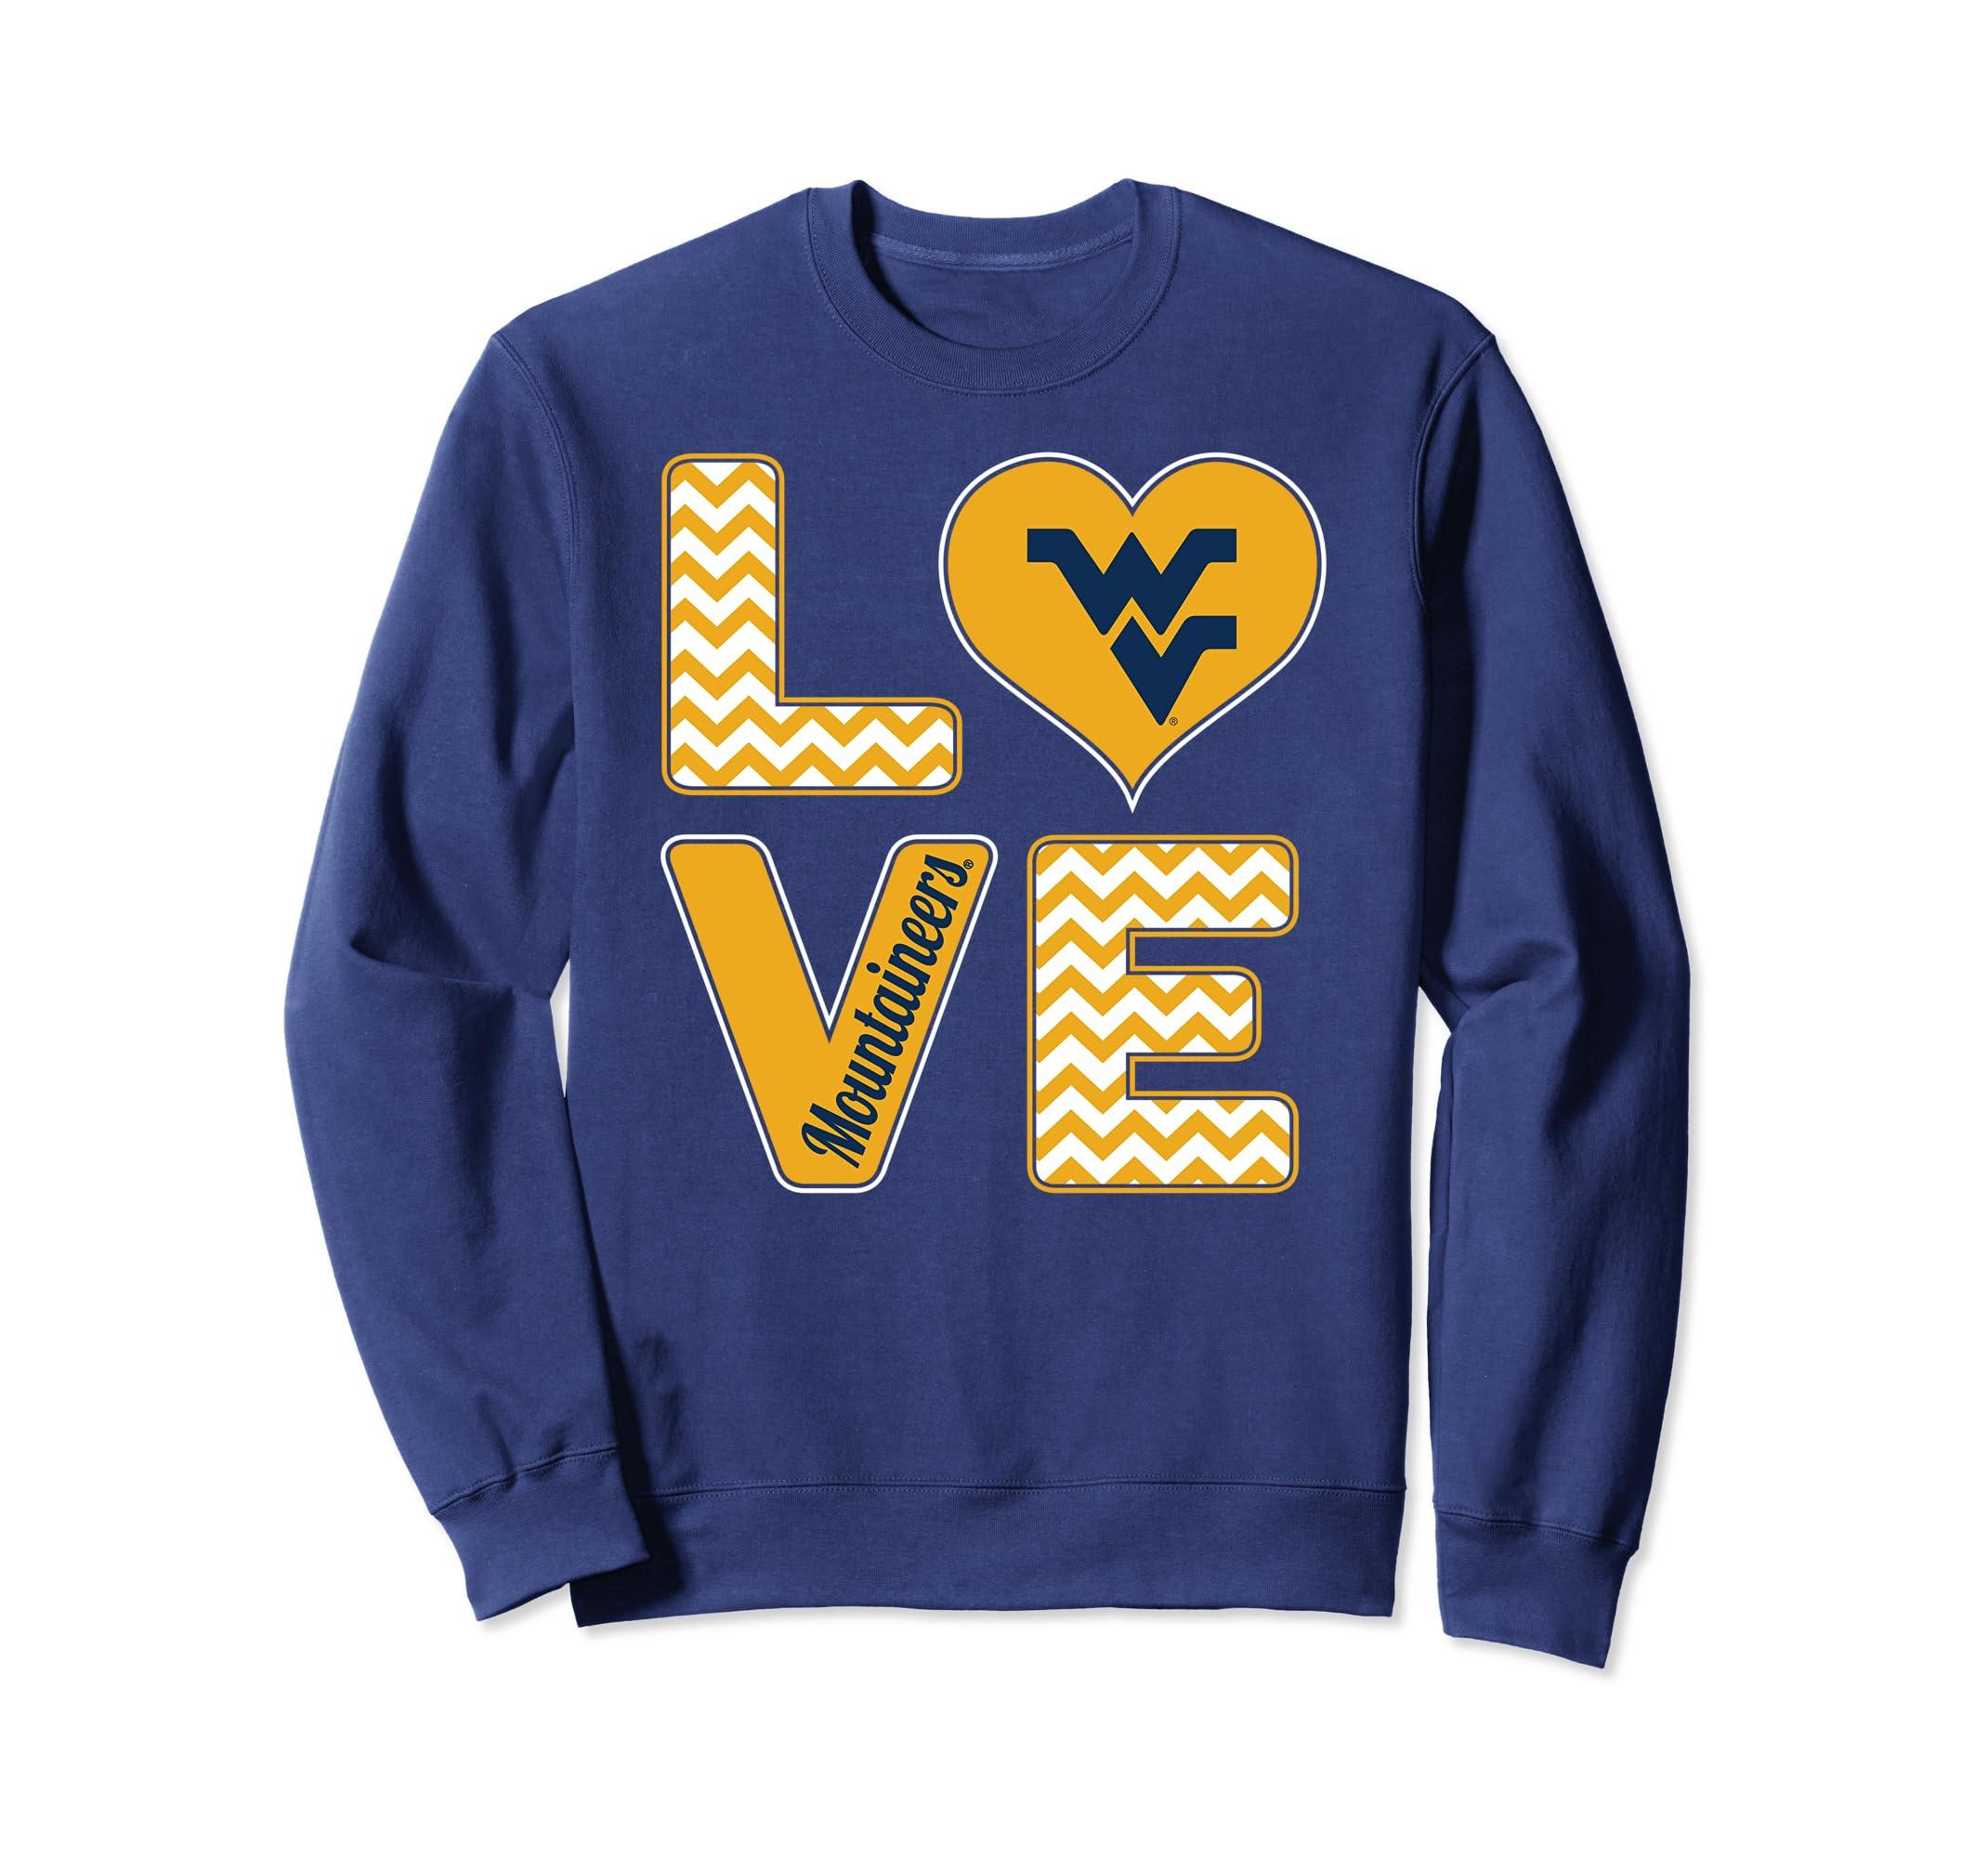 West Virginia Mountaineers Stacked Love Sweatshirt - Apparel-SFL